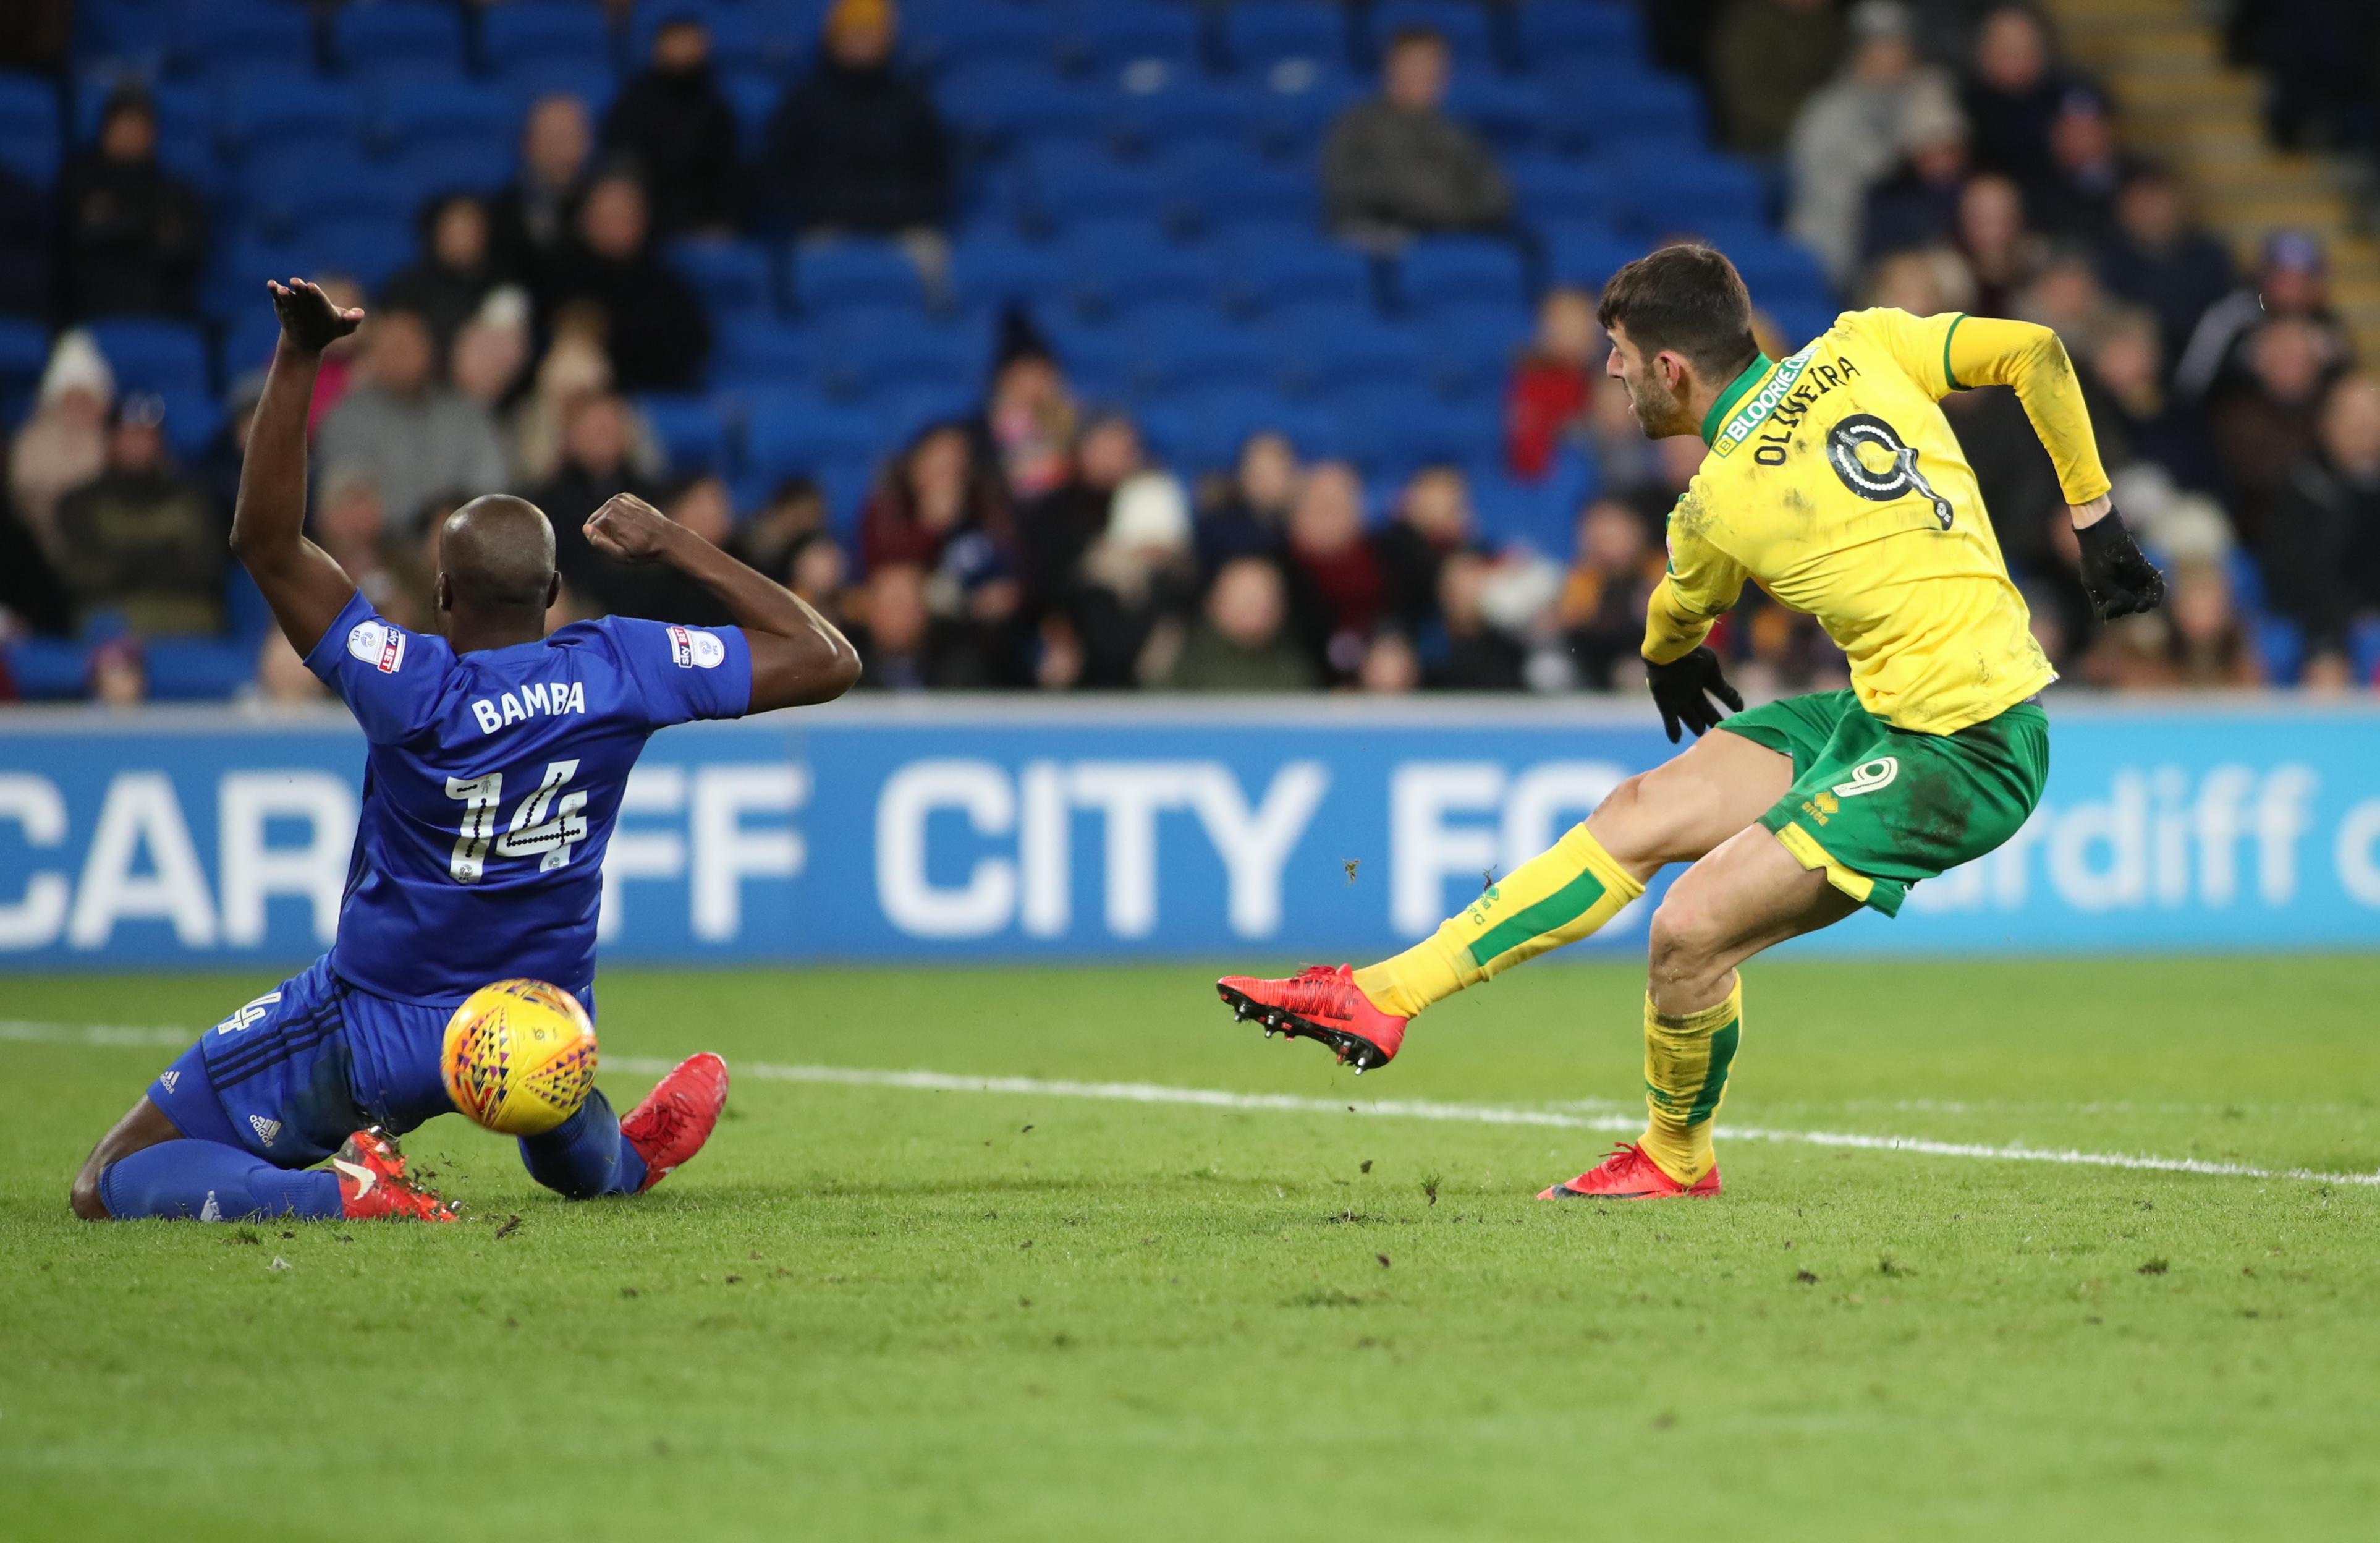 2017 EFL Championship Cardiff City v Norwich City Dec 1st